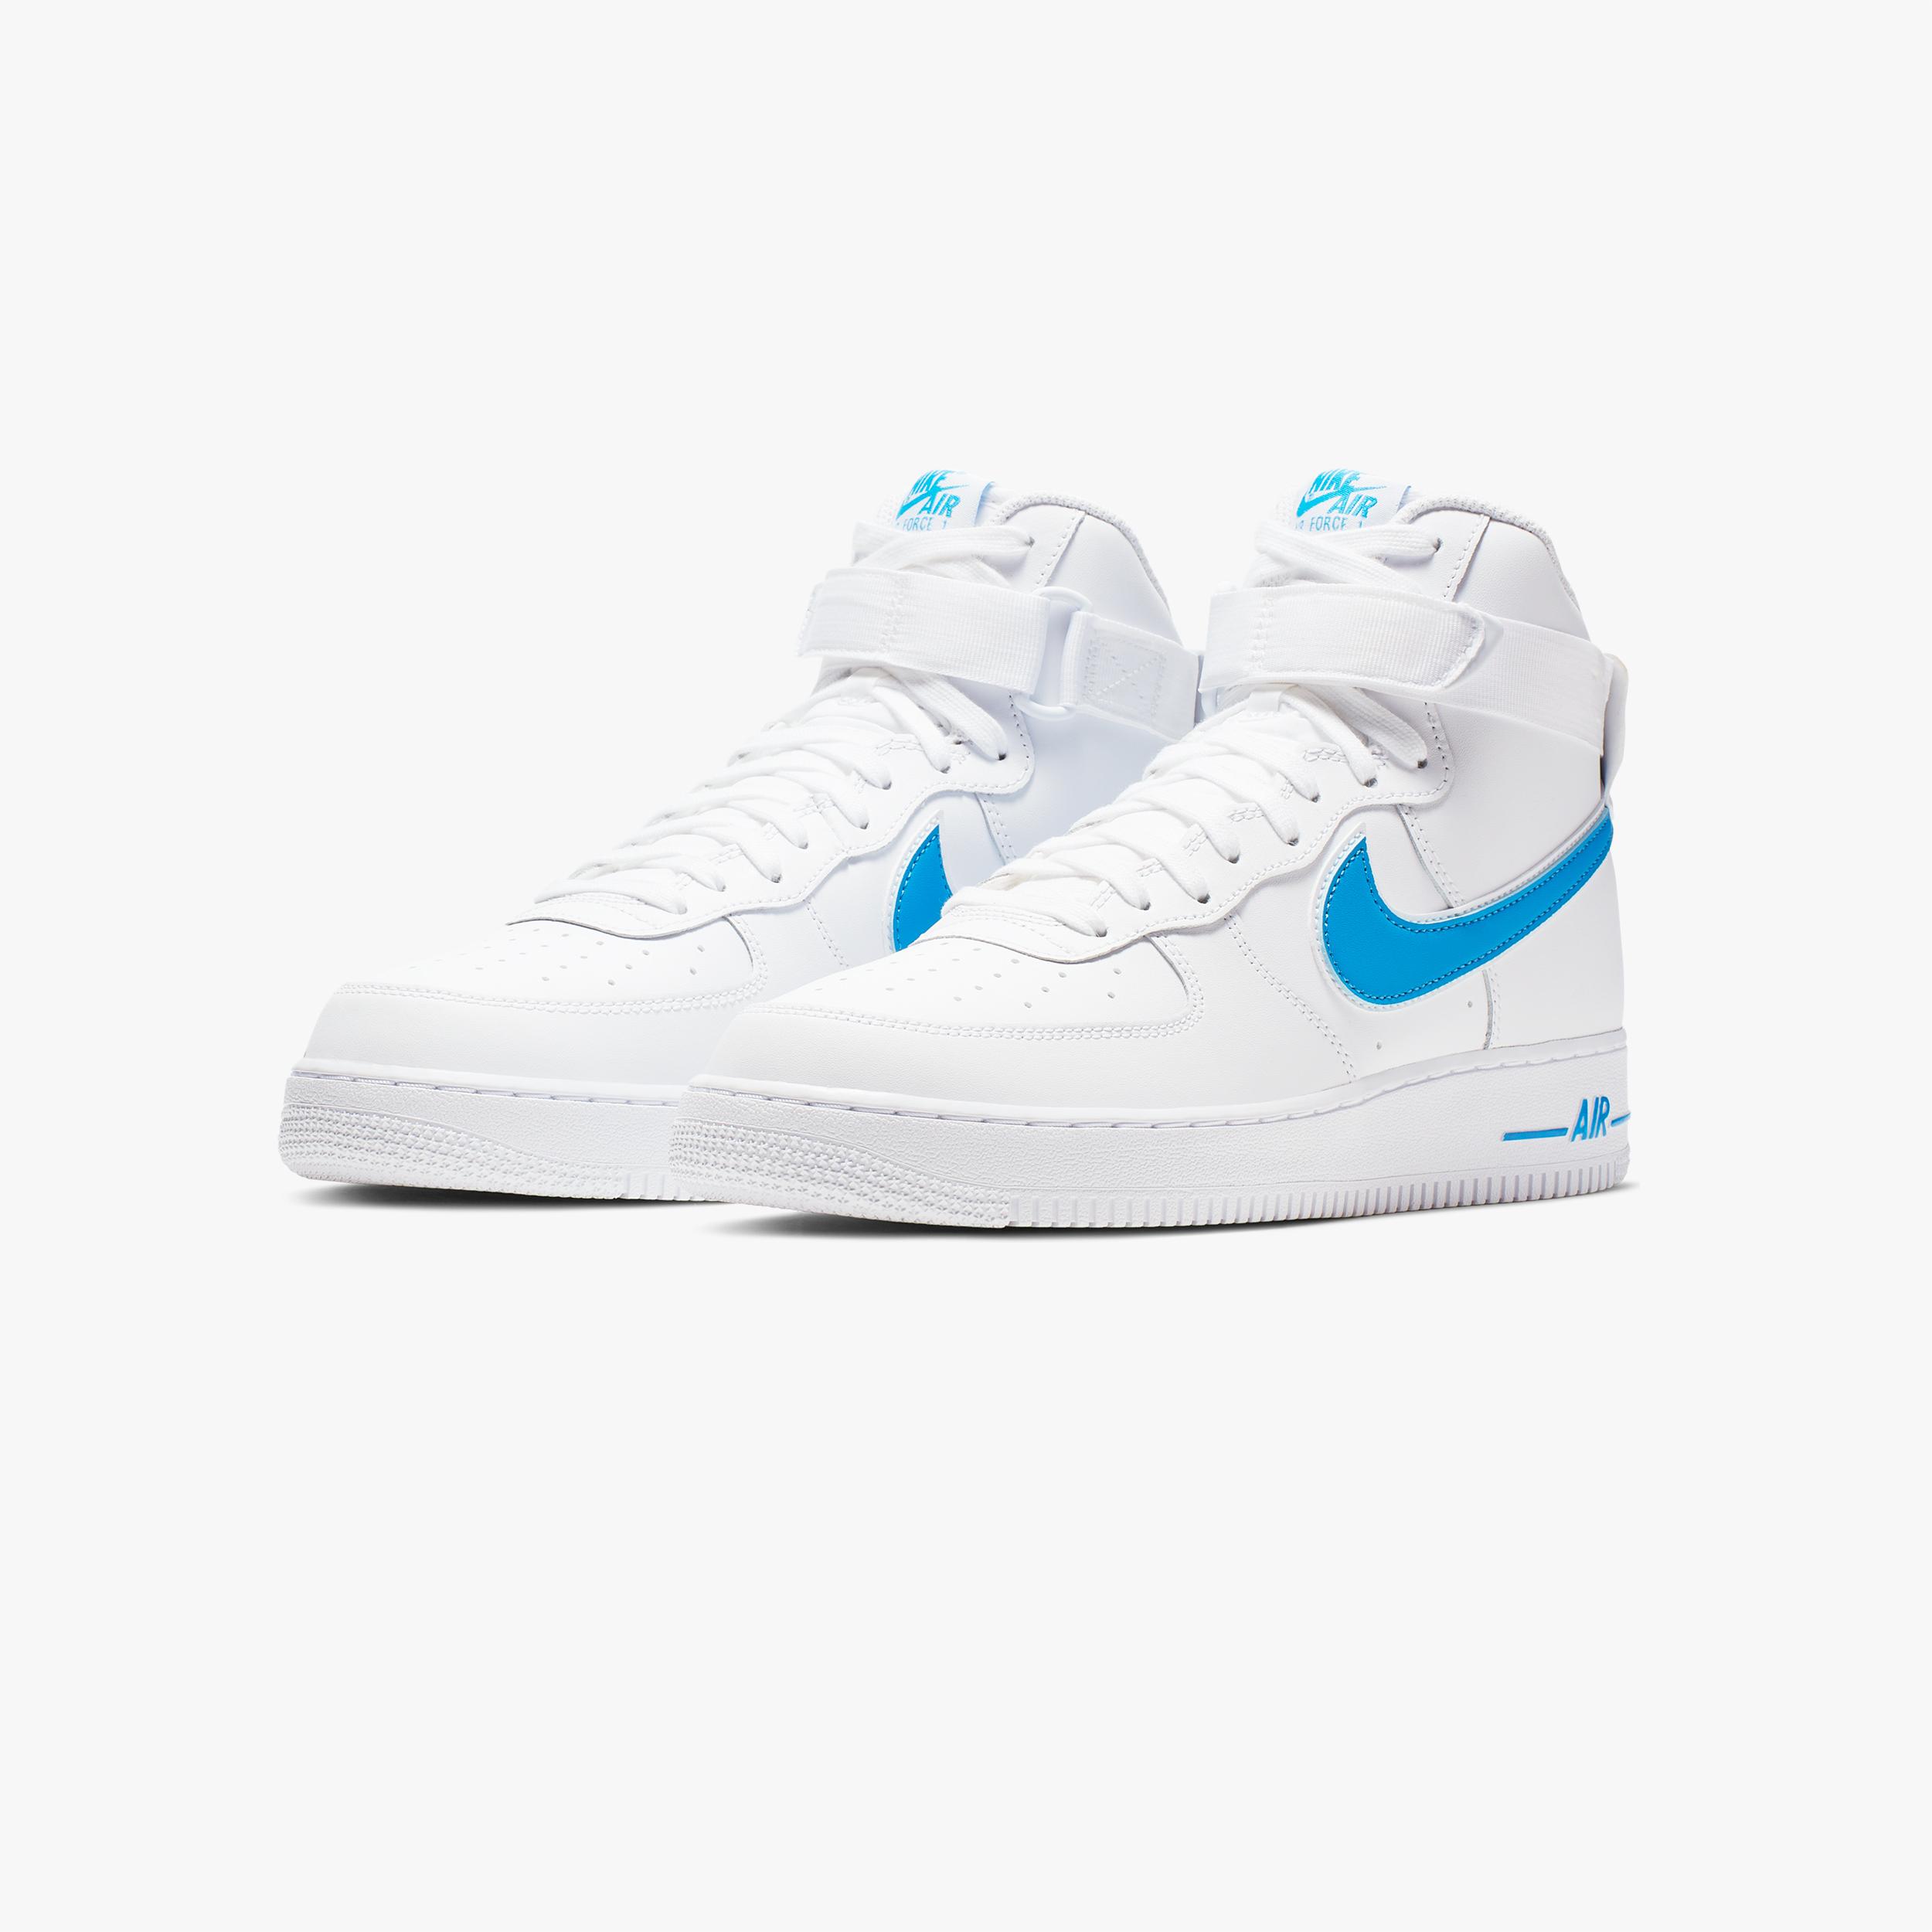 Nike Air Force 1 High 07 3 At4141 102 Sneakersnstuff